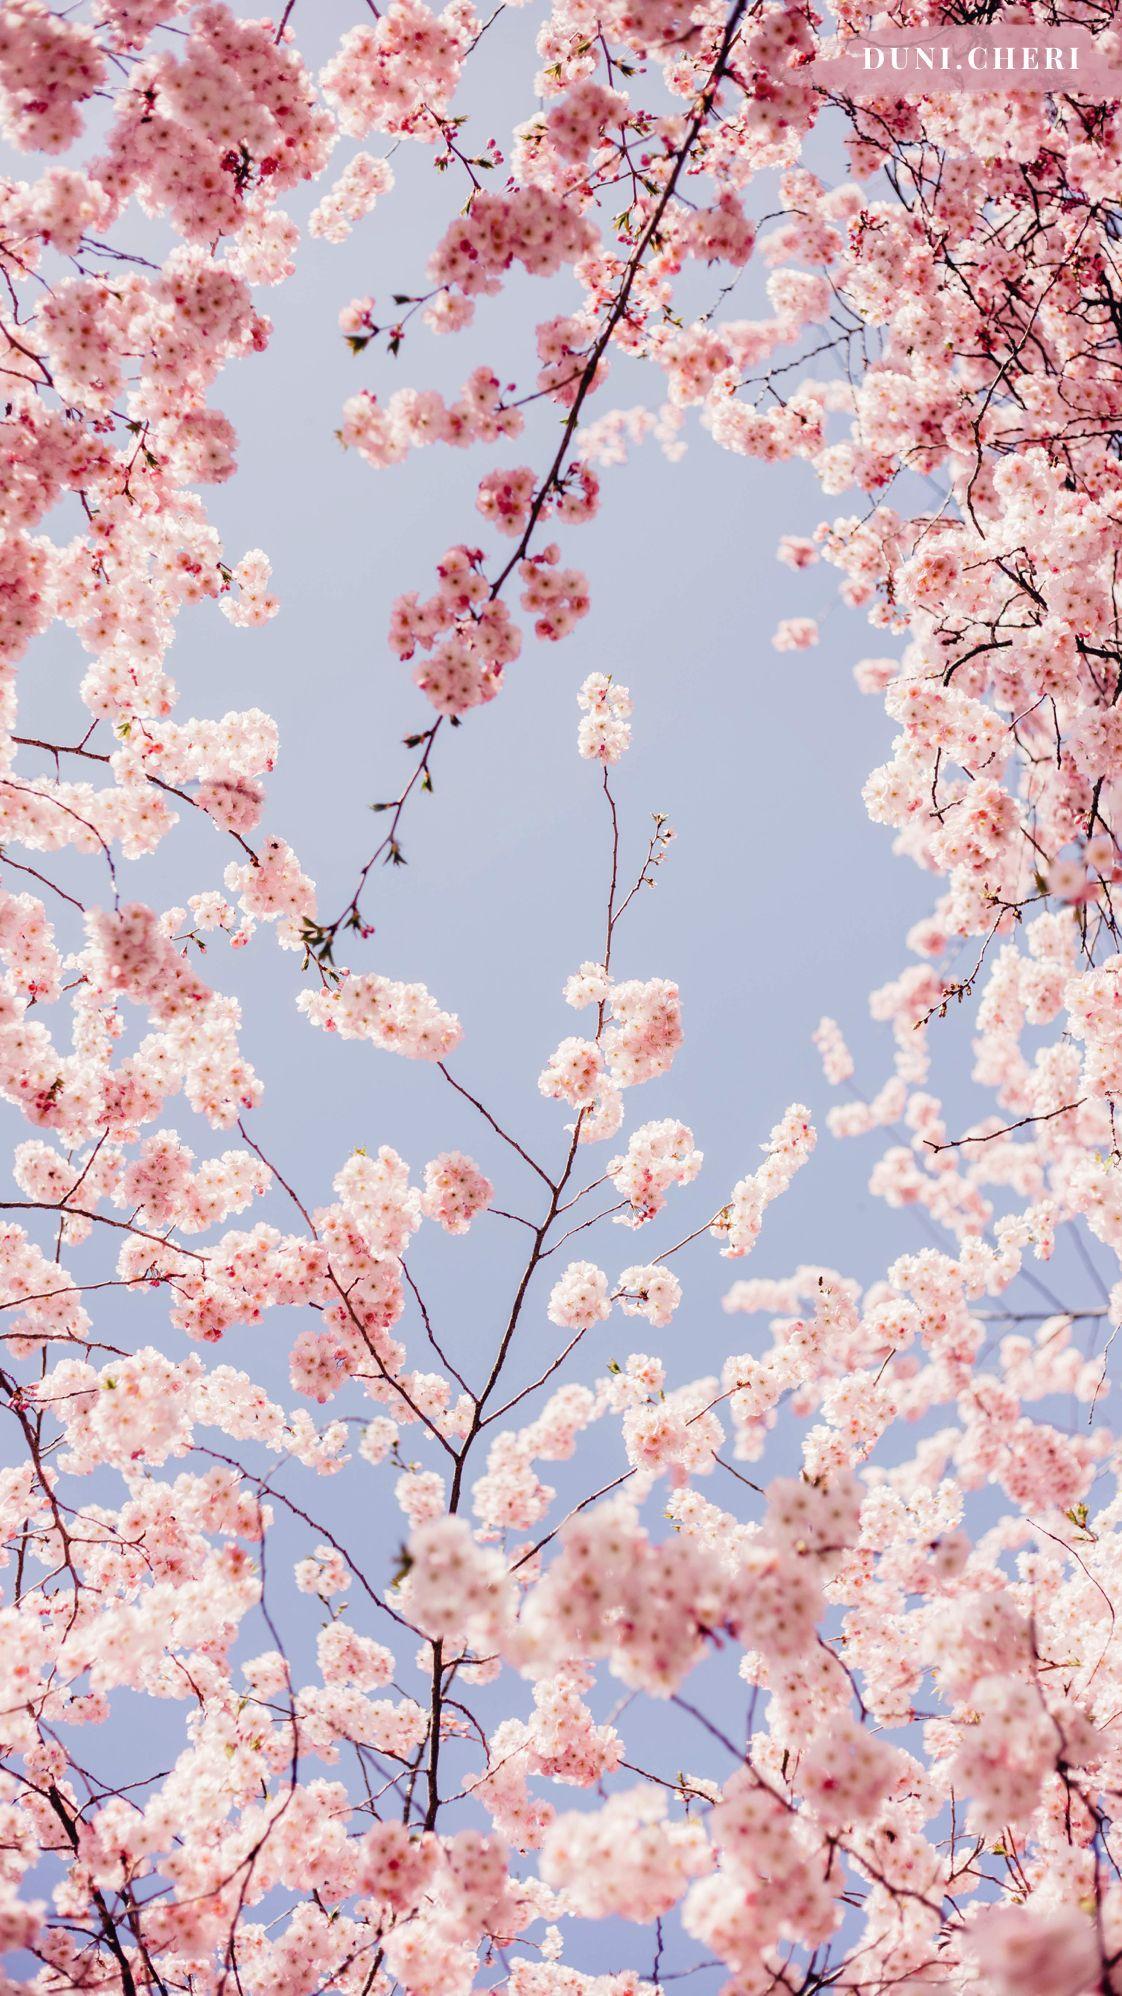 26 Wallpaper Iphone Wallpaper Anime Cherry Blossom Orochi Wallpaper